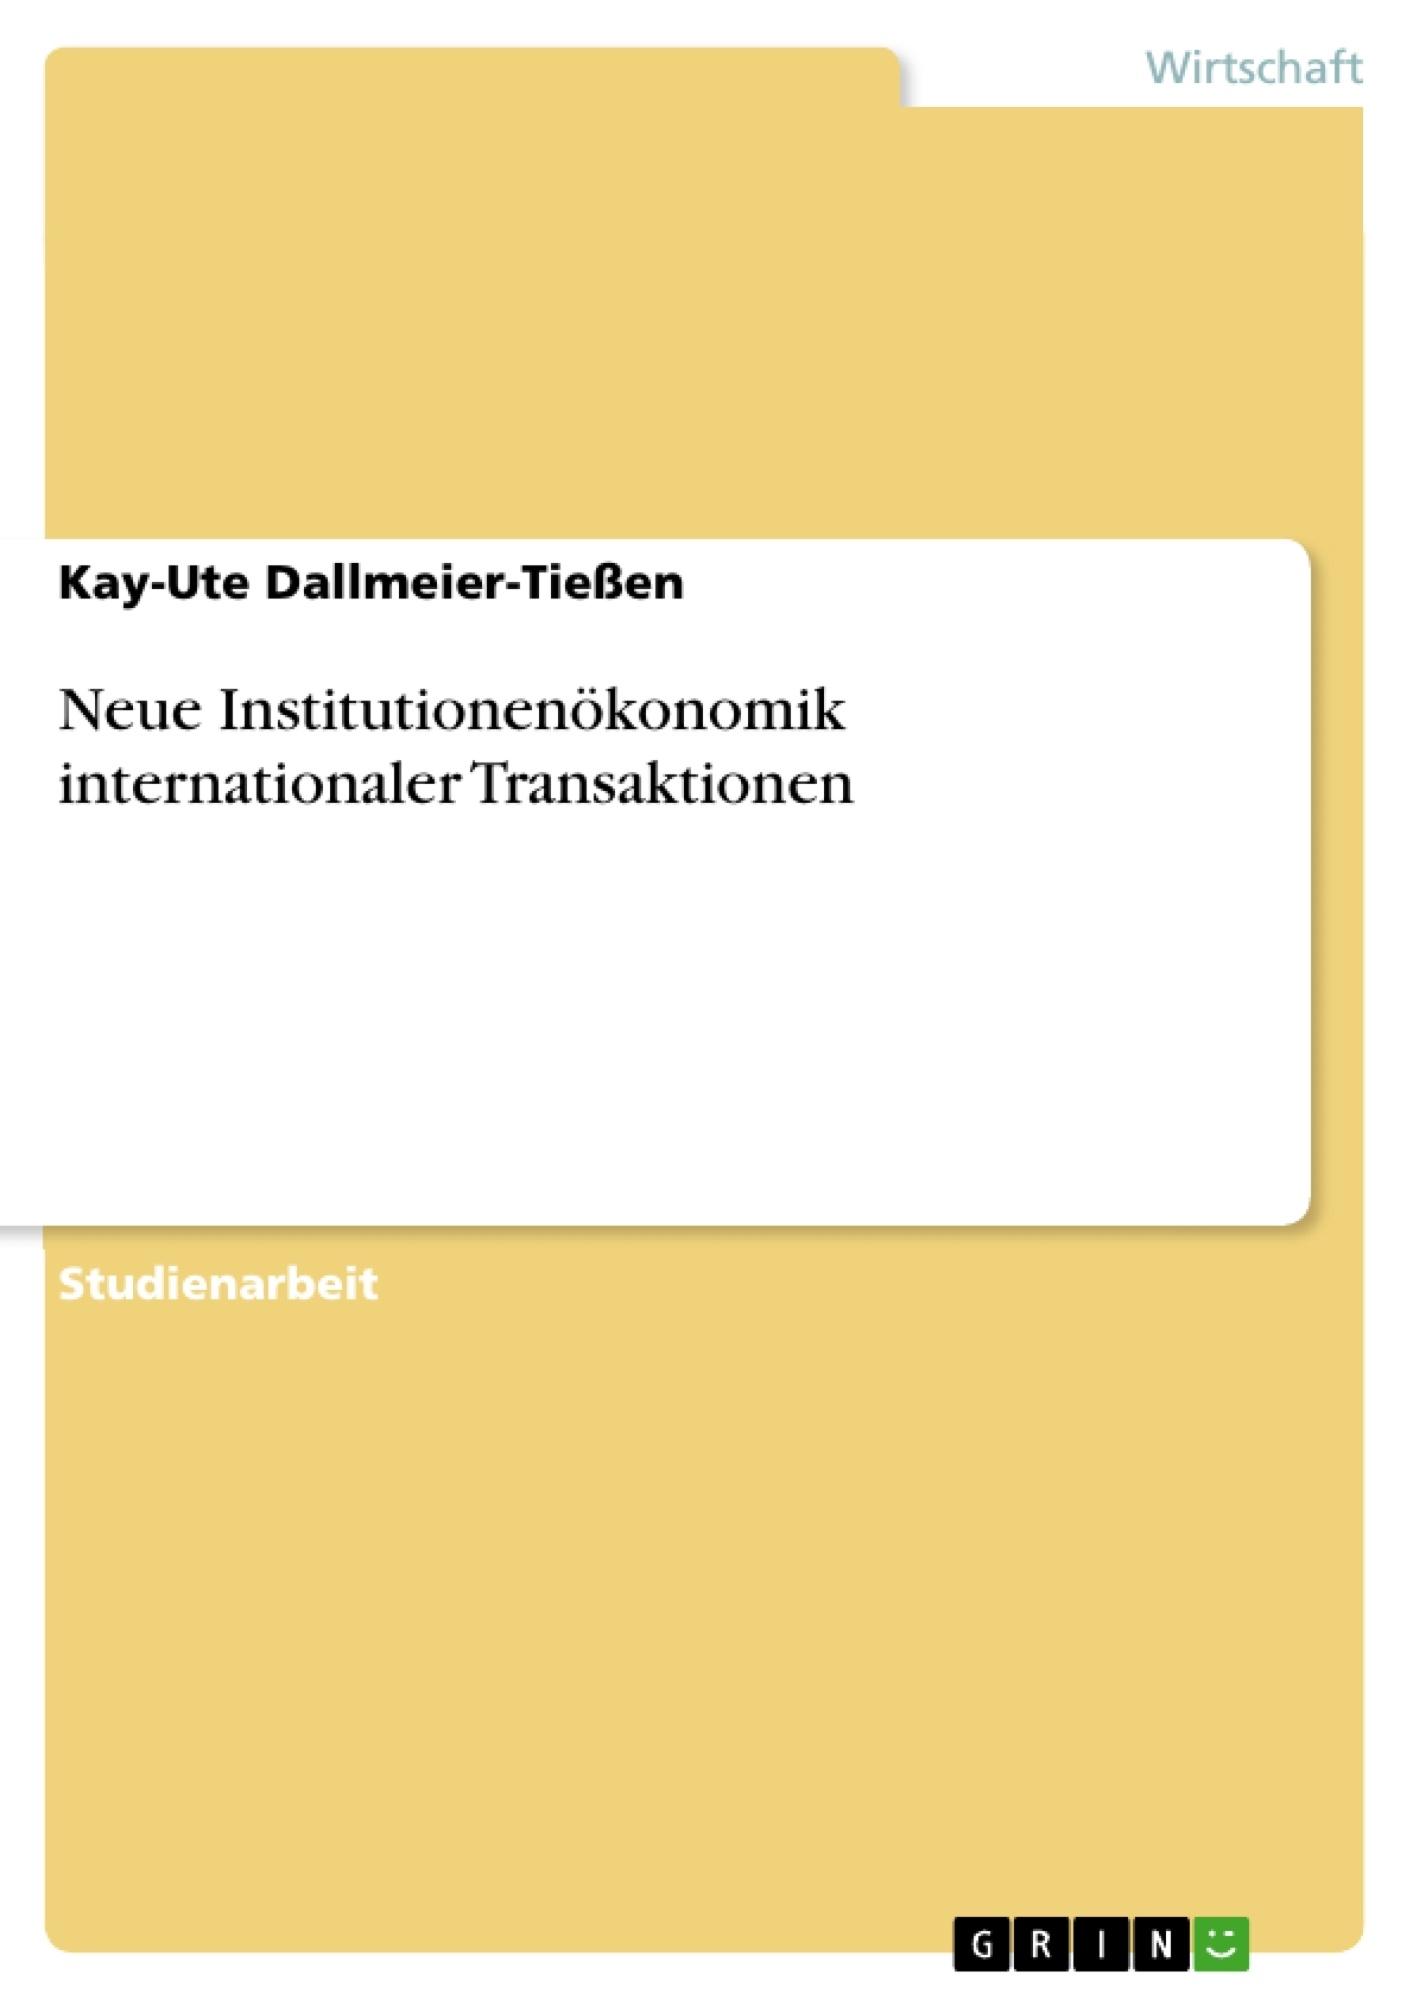 Titel: Neue Institutionenökonomik internationaler Transaktionen